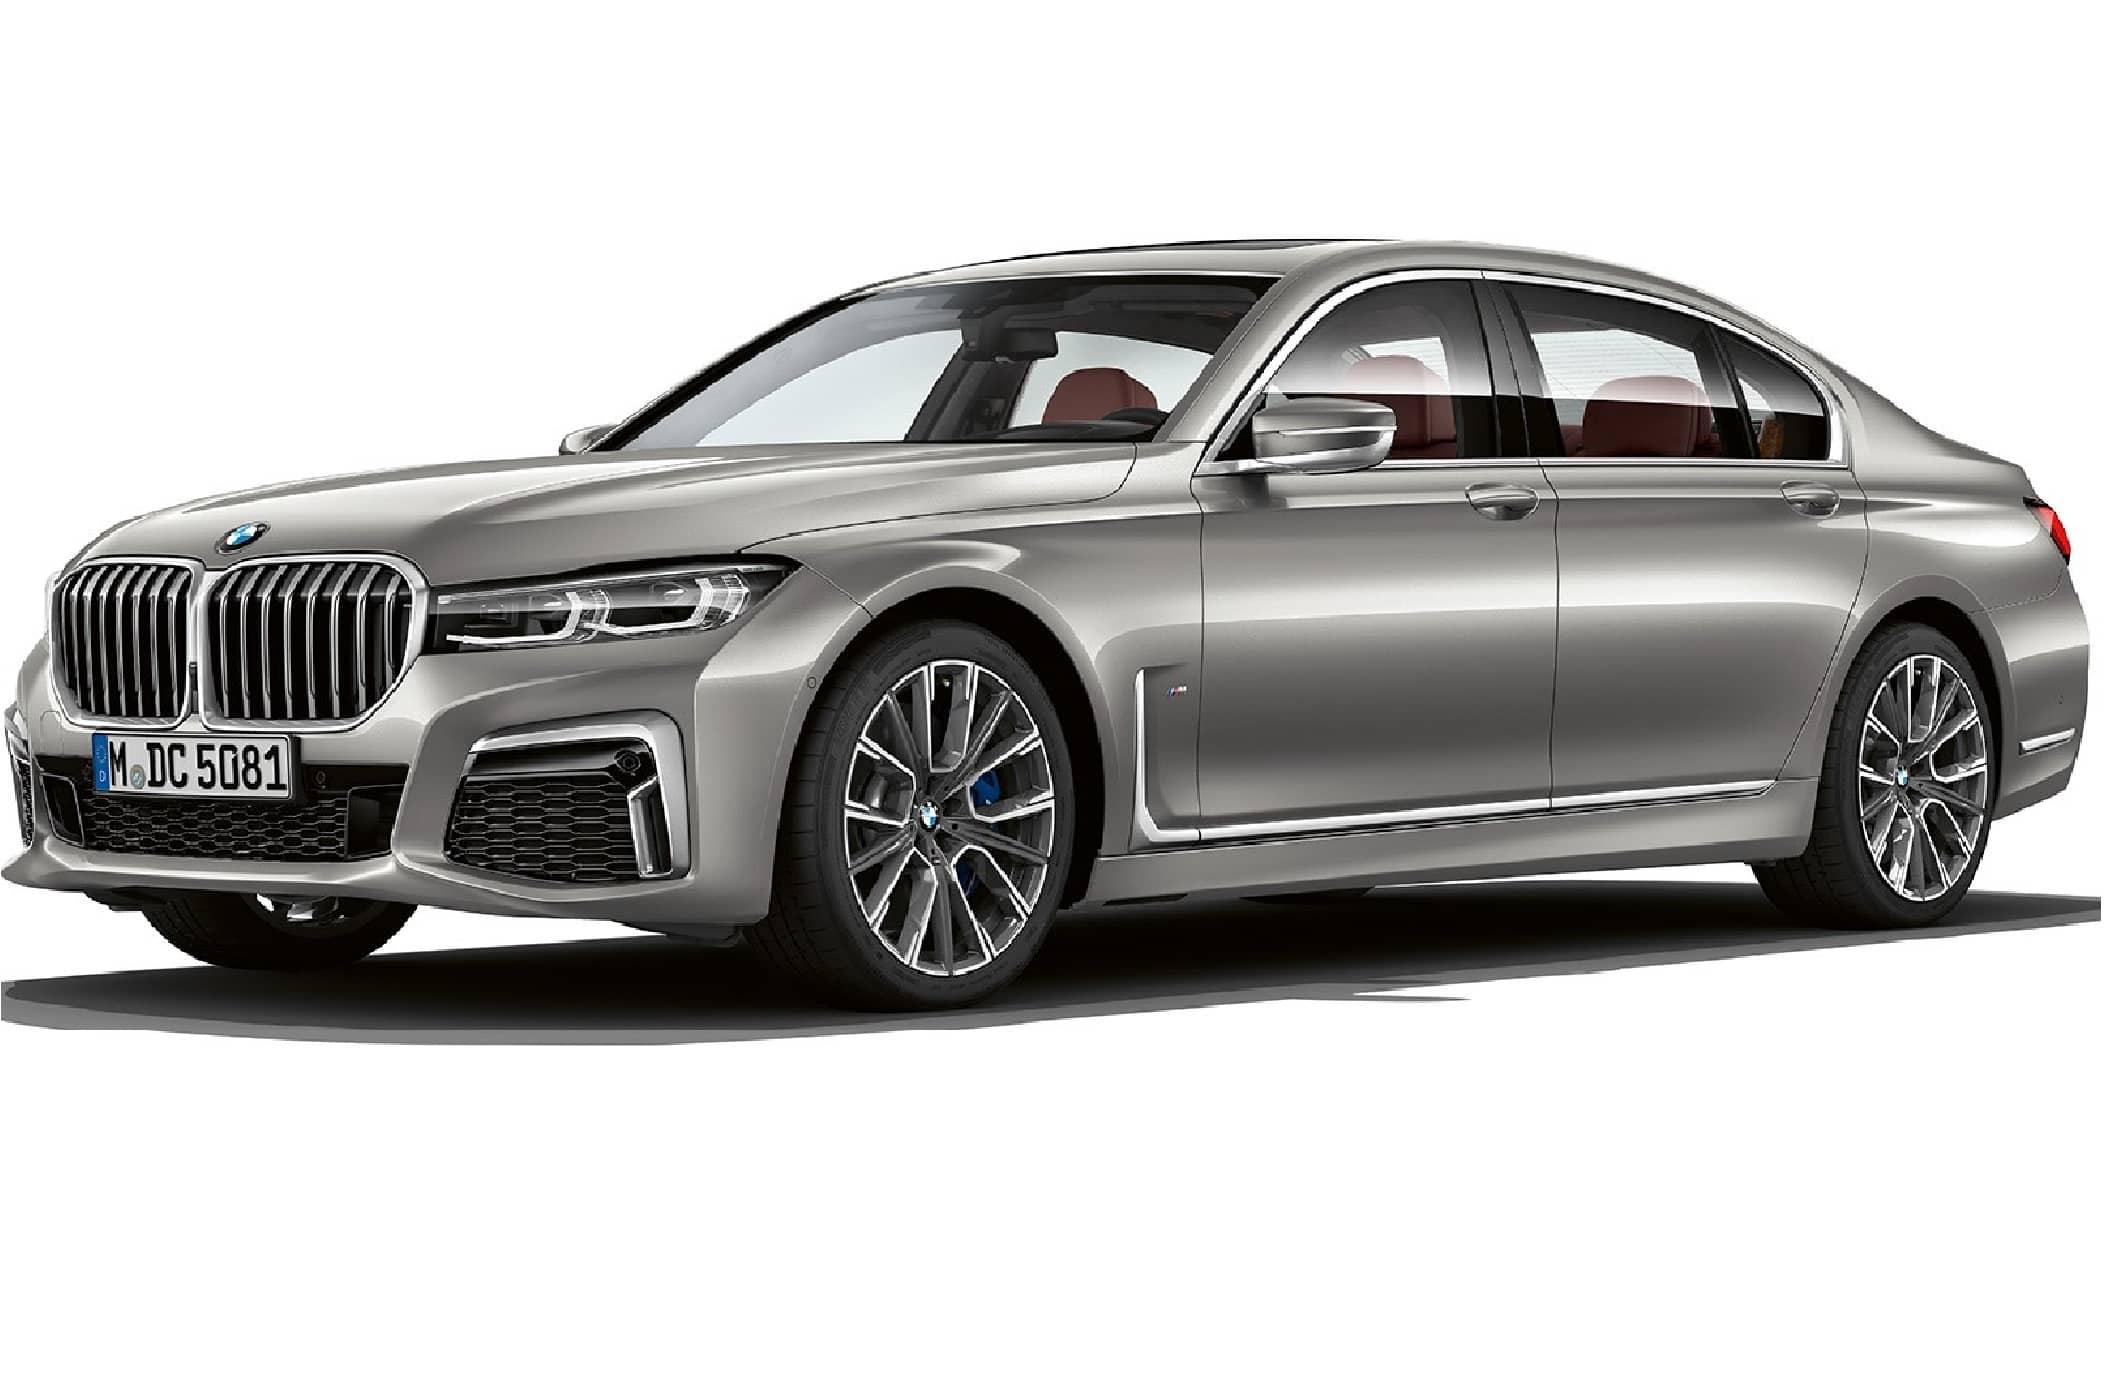 Ремонт тормозов BMW серии 7